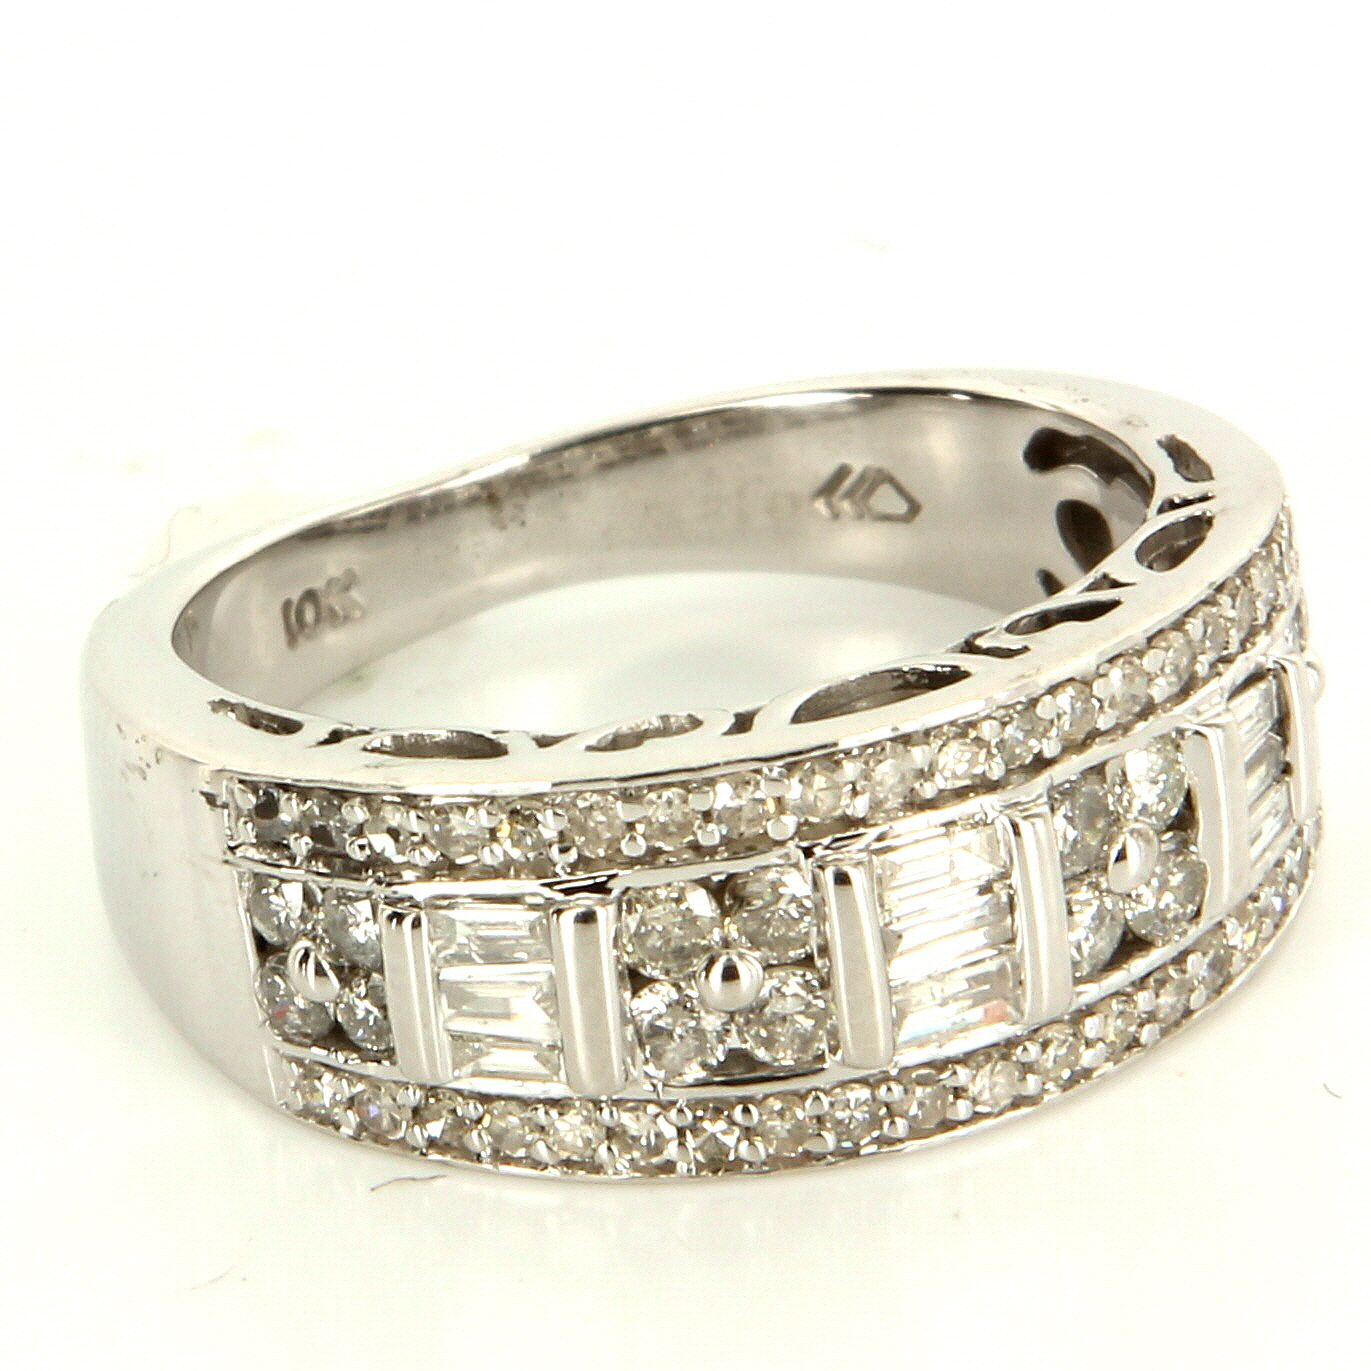 Estate 10 Karat White Gold Diamond Anniversary Band Ring Fine Jewelry Pre Owned Diamond Anniversary Bands Fine Jewelry White Gold Diamonds